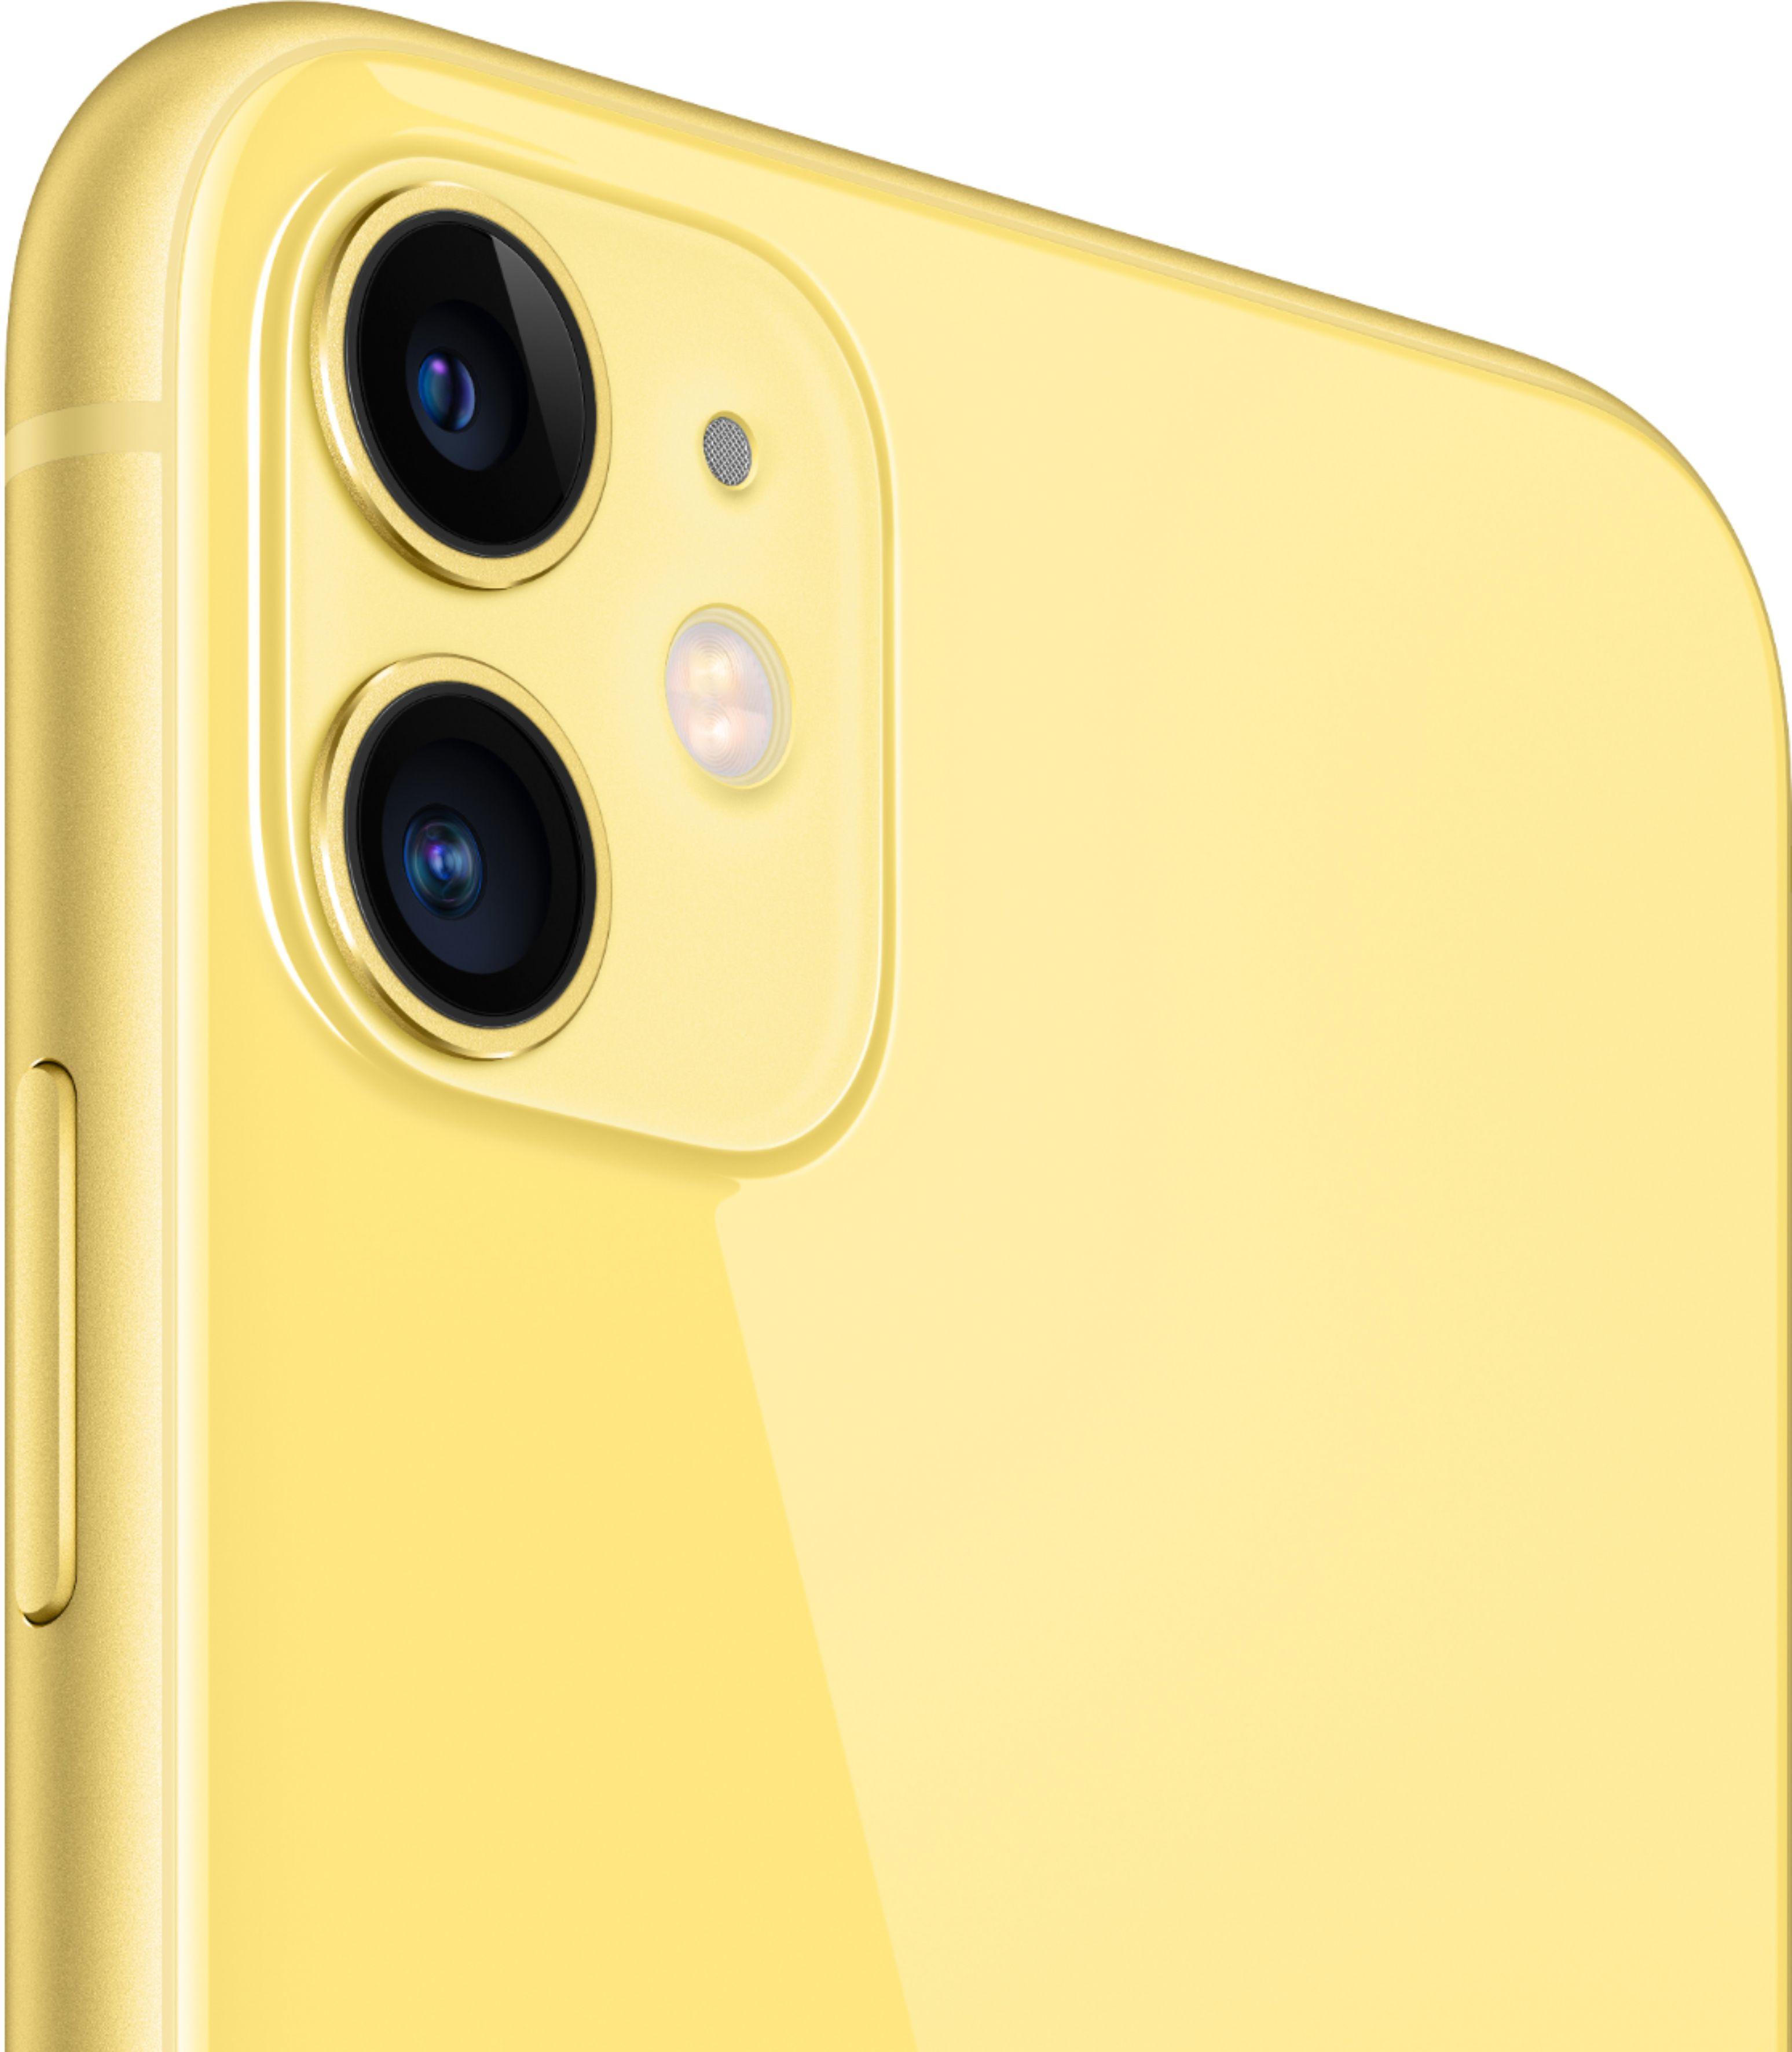 thumbnail 20 - Apple iPhone 11 64GB Factory Unlocked 4G LTE Smartphone